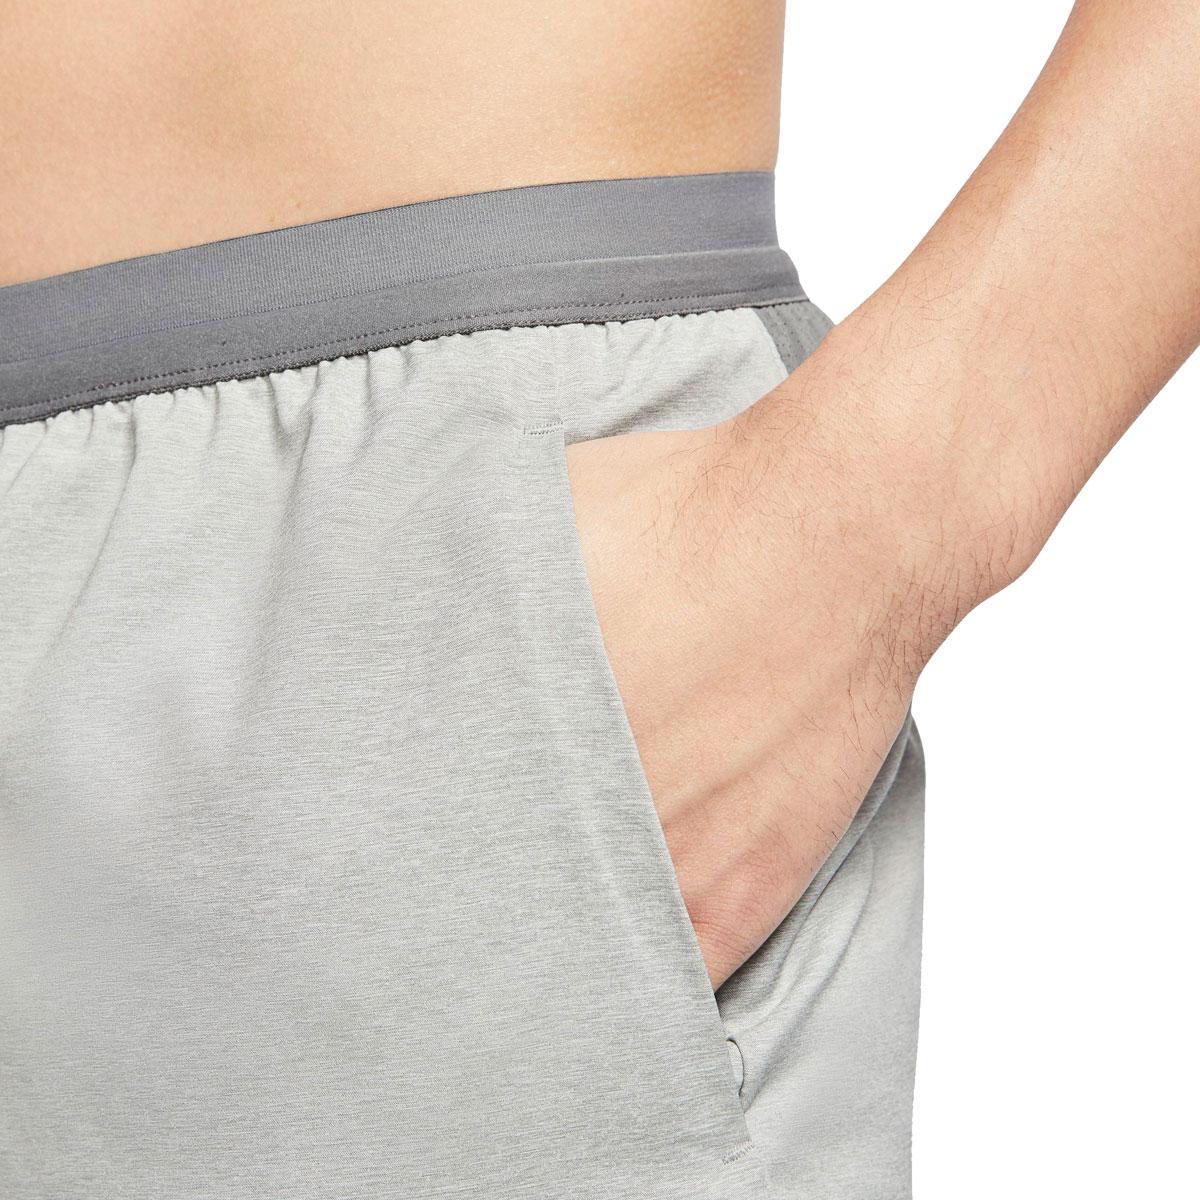 "Men's Nike Flex Stride 7"" Brief Running Shorts - Color: Iron Grey/Heather/Reflective Silver - Size: S, Iron Grey/Heather/Reflective Silver, large, image 3"